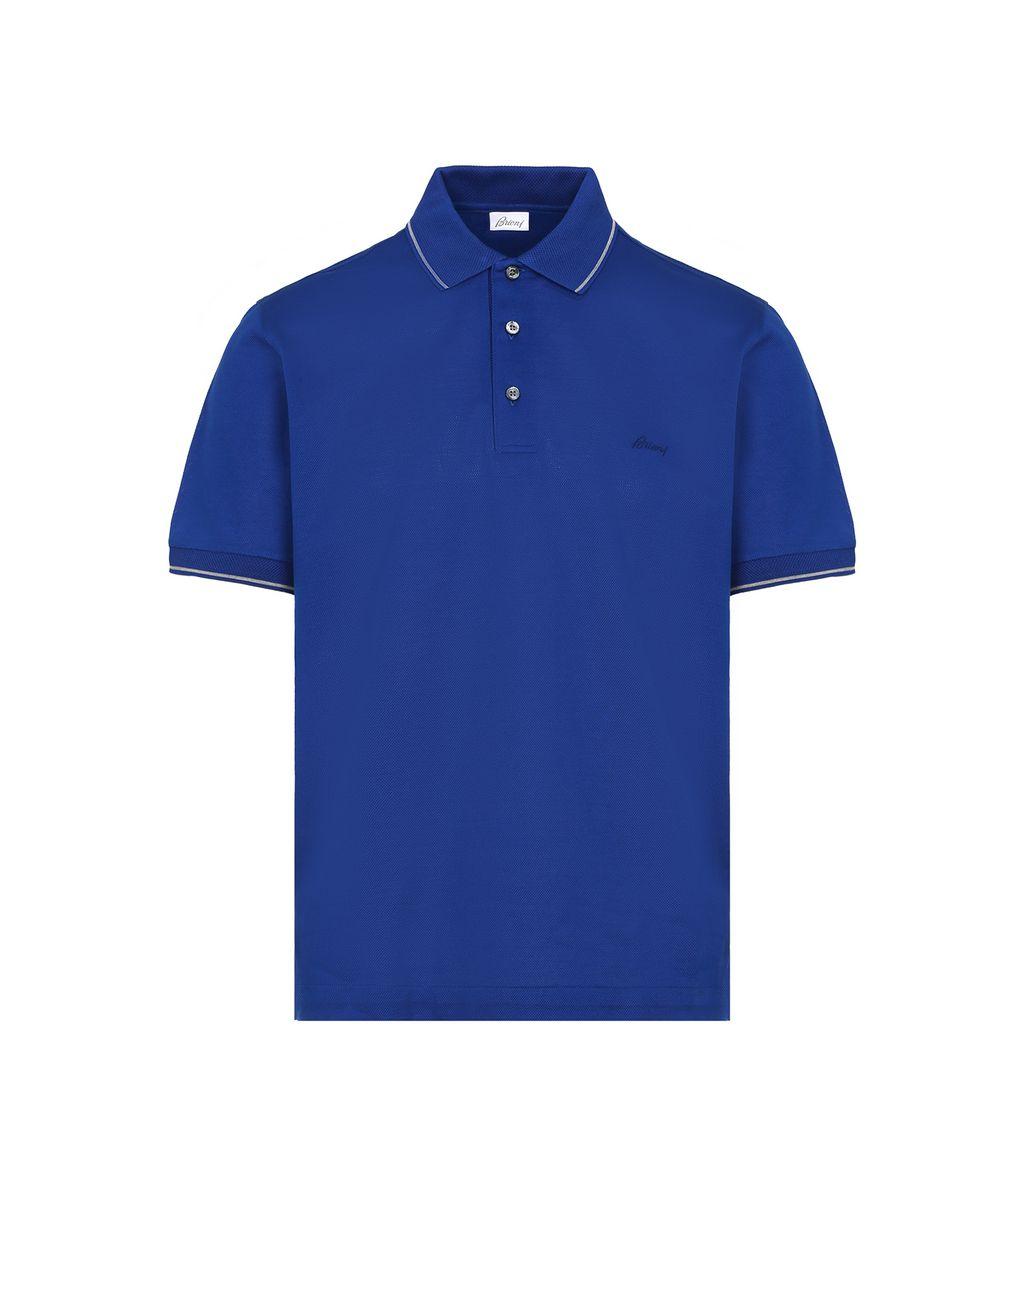 BRIONI Синяя поло из ткани пике Футболки и поло Для Мужчин f